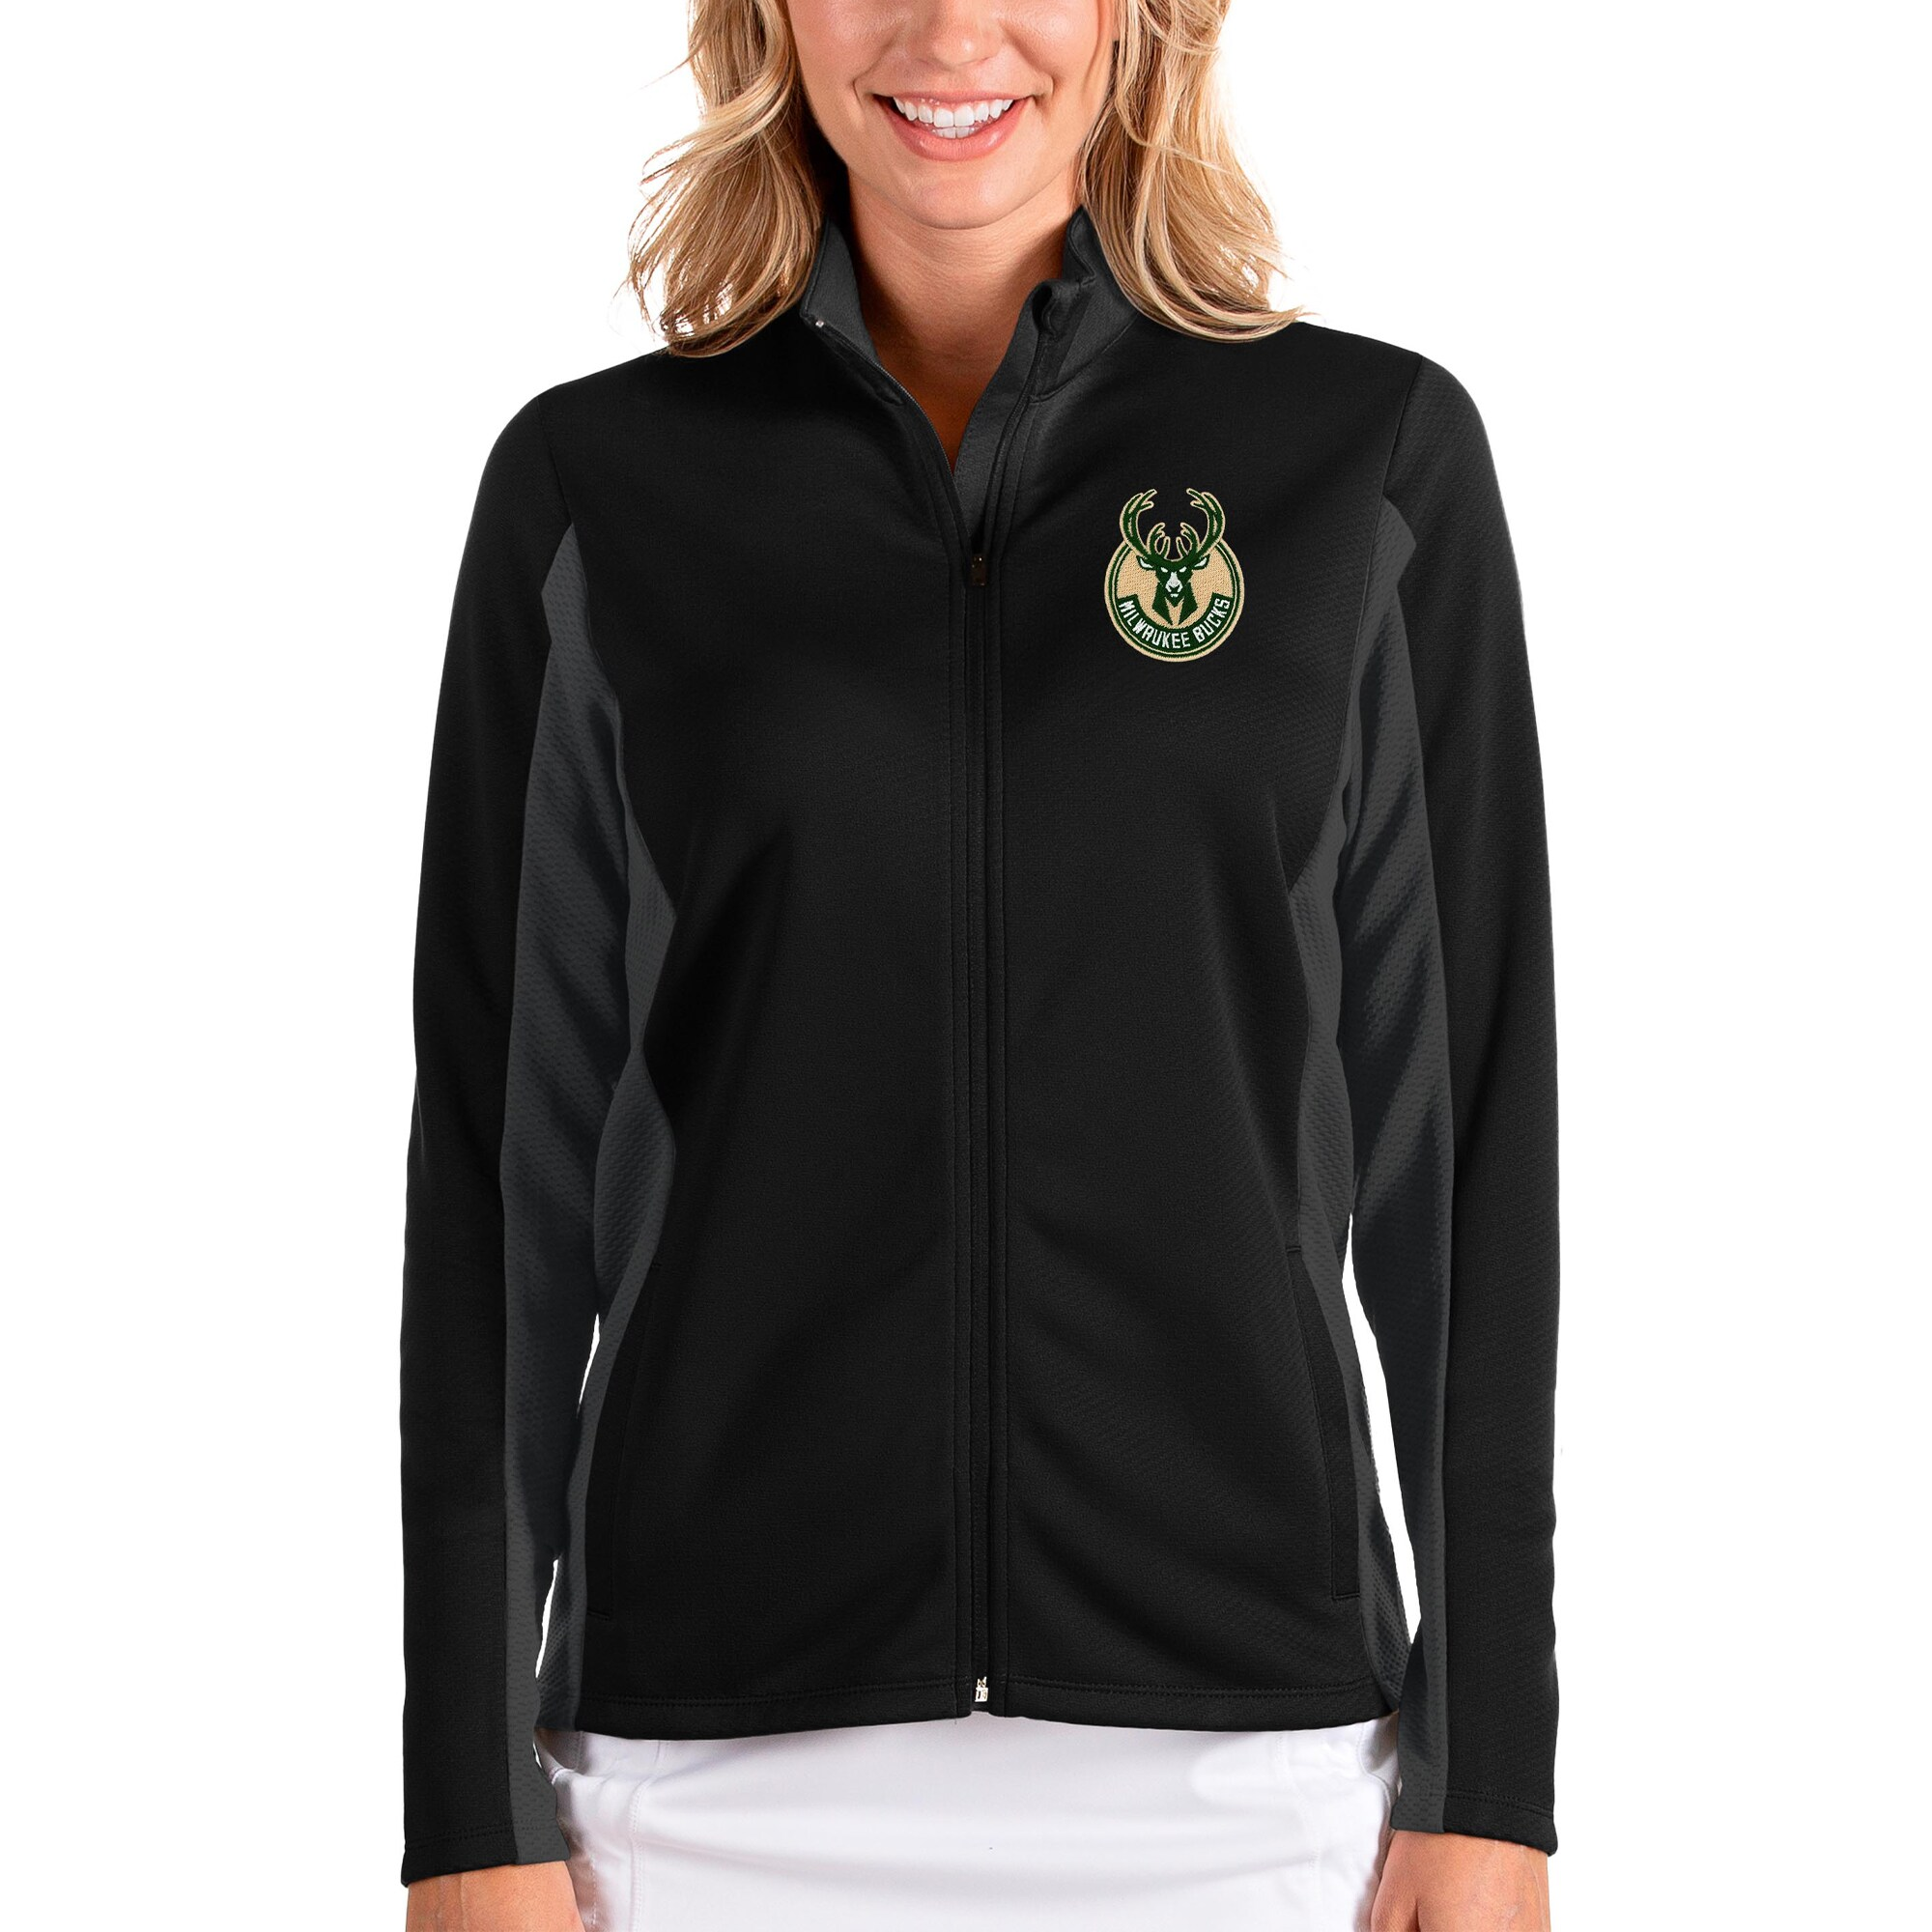 Milwaukee Bucks Antigua Women's Passage Full-Zip Jacket - Black/Charcoal